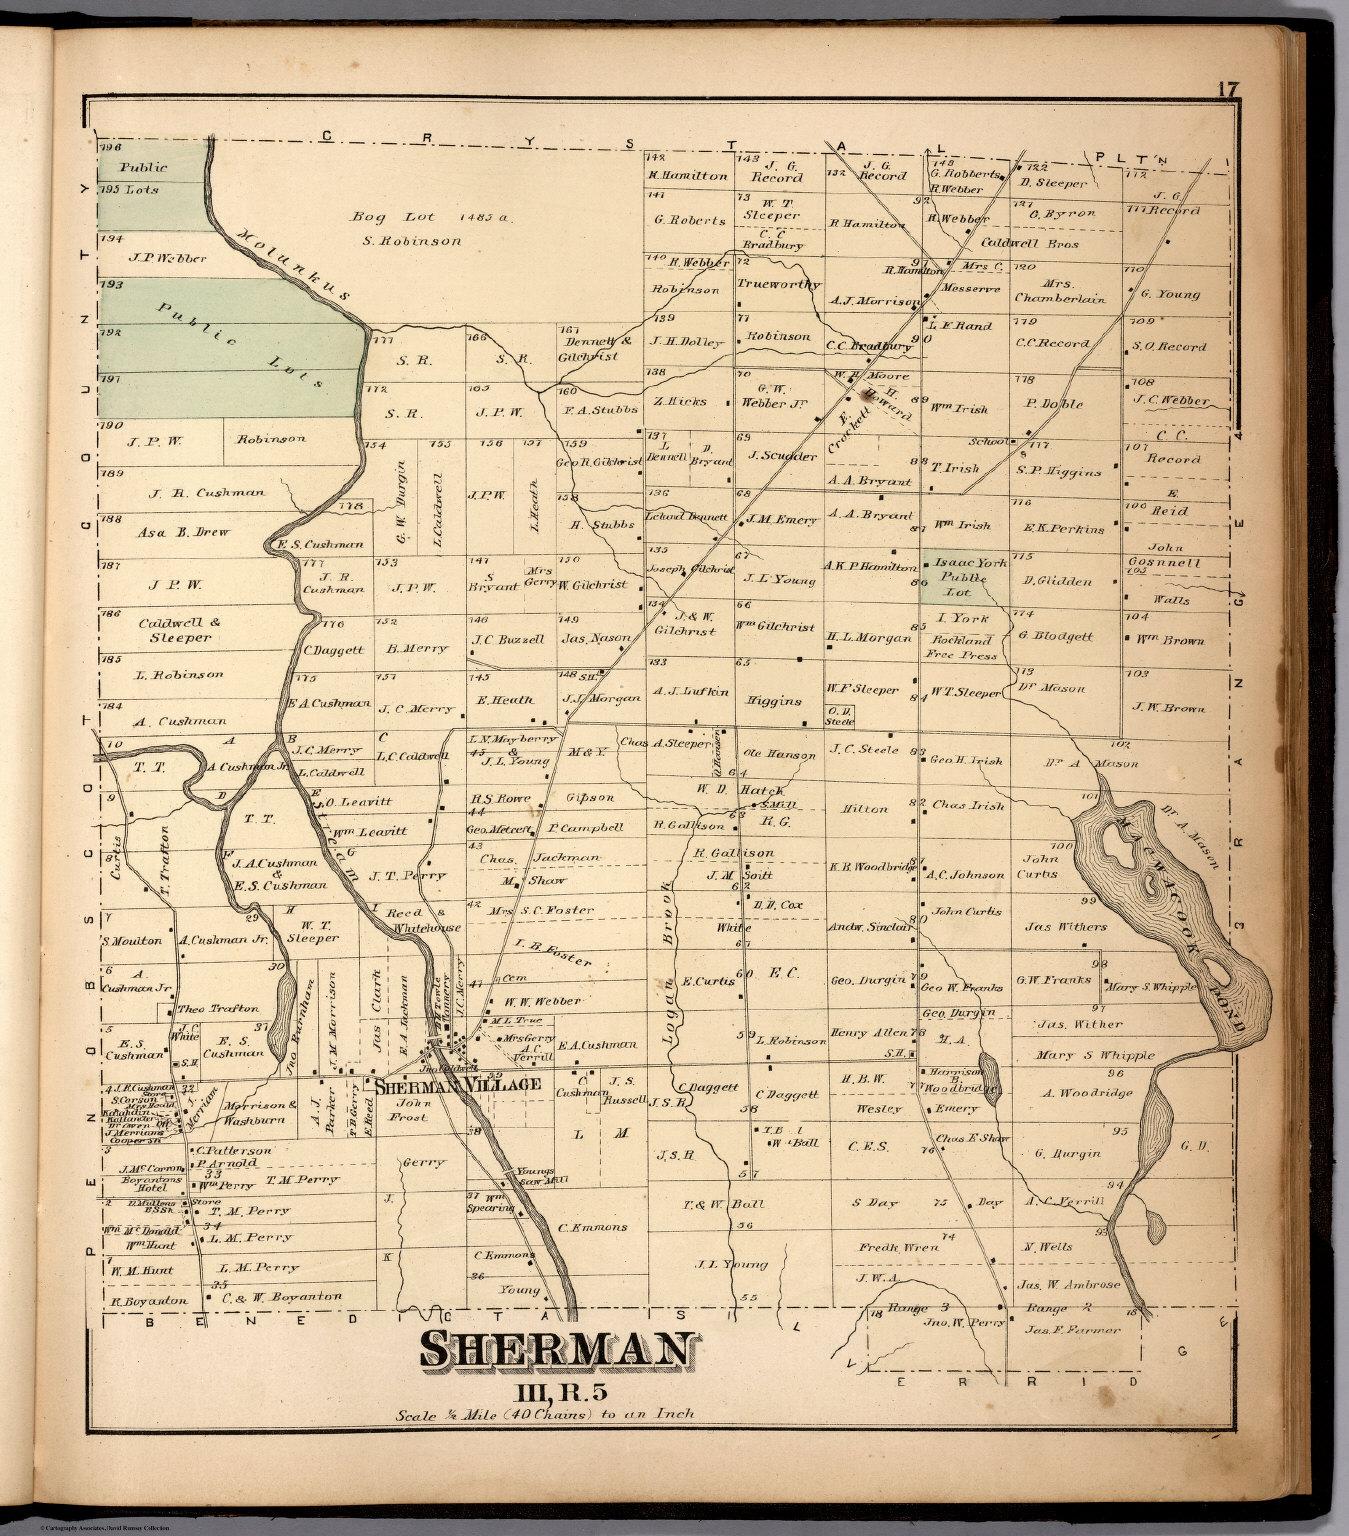 Sherman Iii R 5 Aroostook County Maine David Rumsey Historical